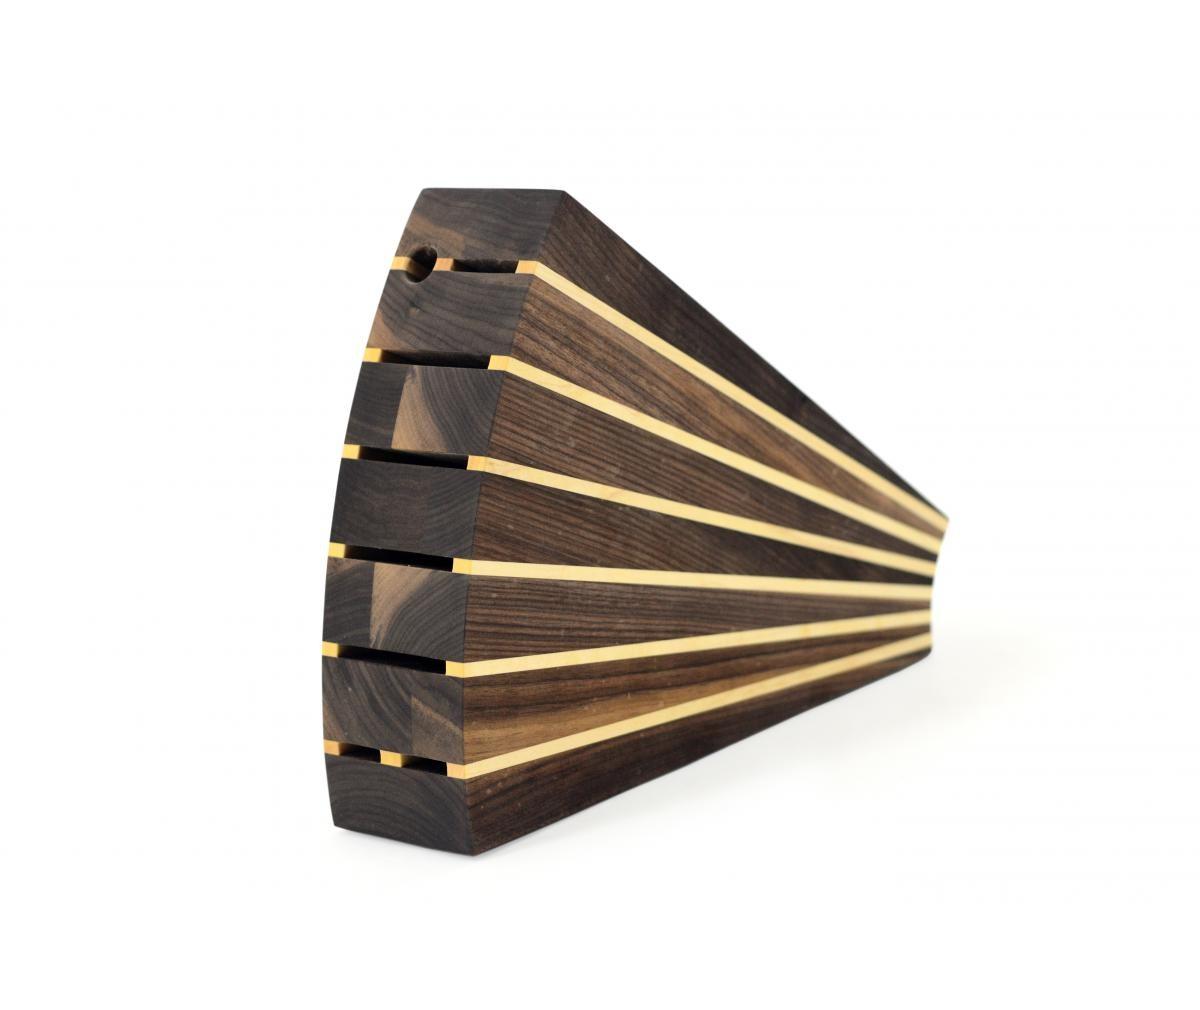 bloc couteaux de cuisine bloc 5 couteaux de cuisine laqu. Black Bedroom Furniture Sets. Home Design Ideas